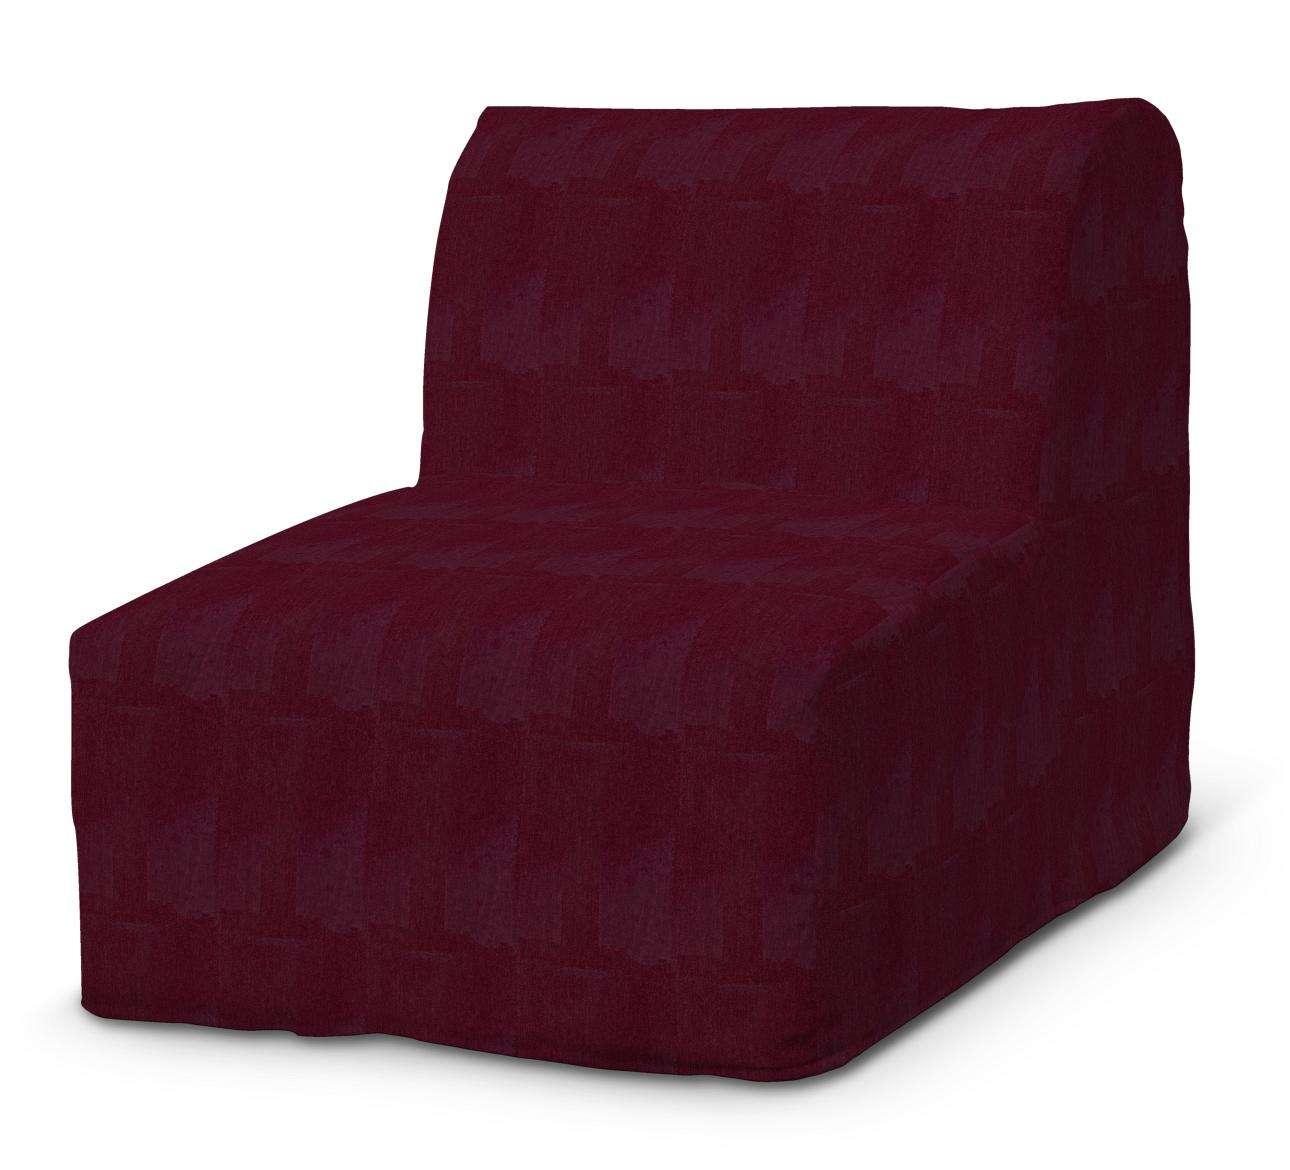 Pokrowiec na fotel Lycksele prosty fotel Lycksele w kolekcji Chenille, tkanina: 702-19